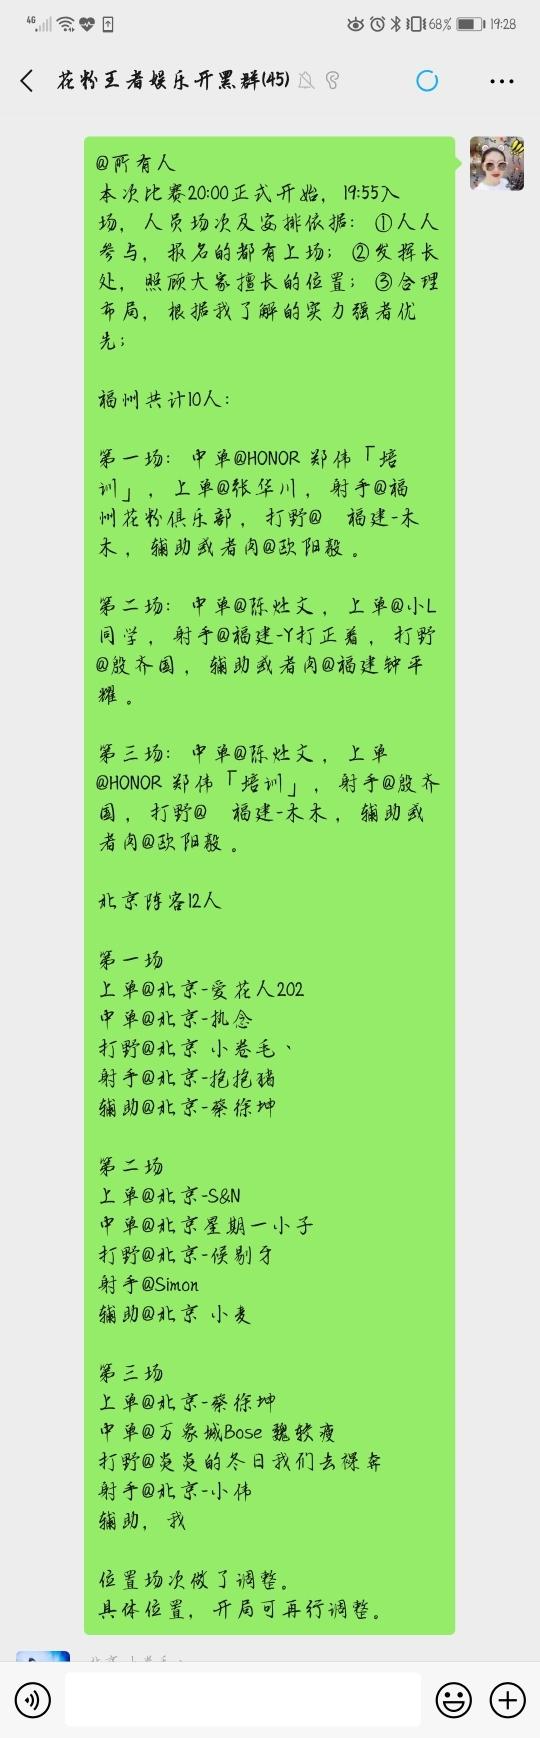 Screenshot_20191103_192833_com.tencent.mm.jpg